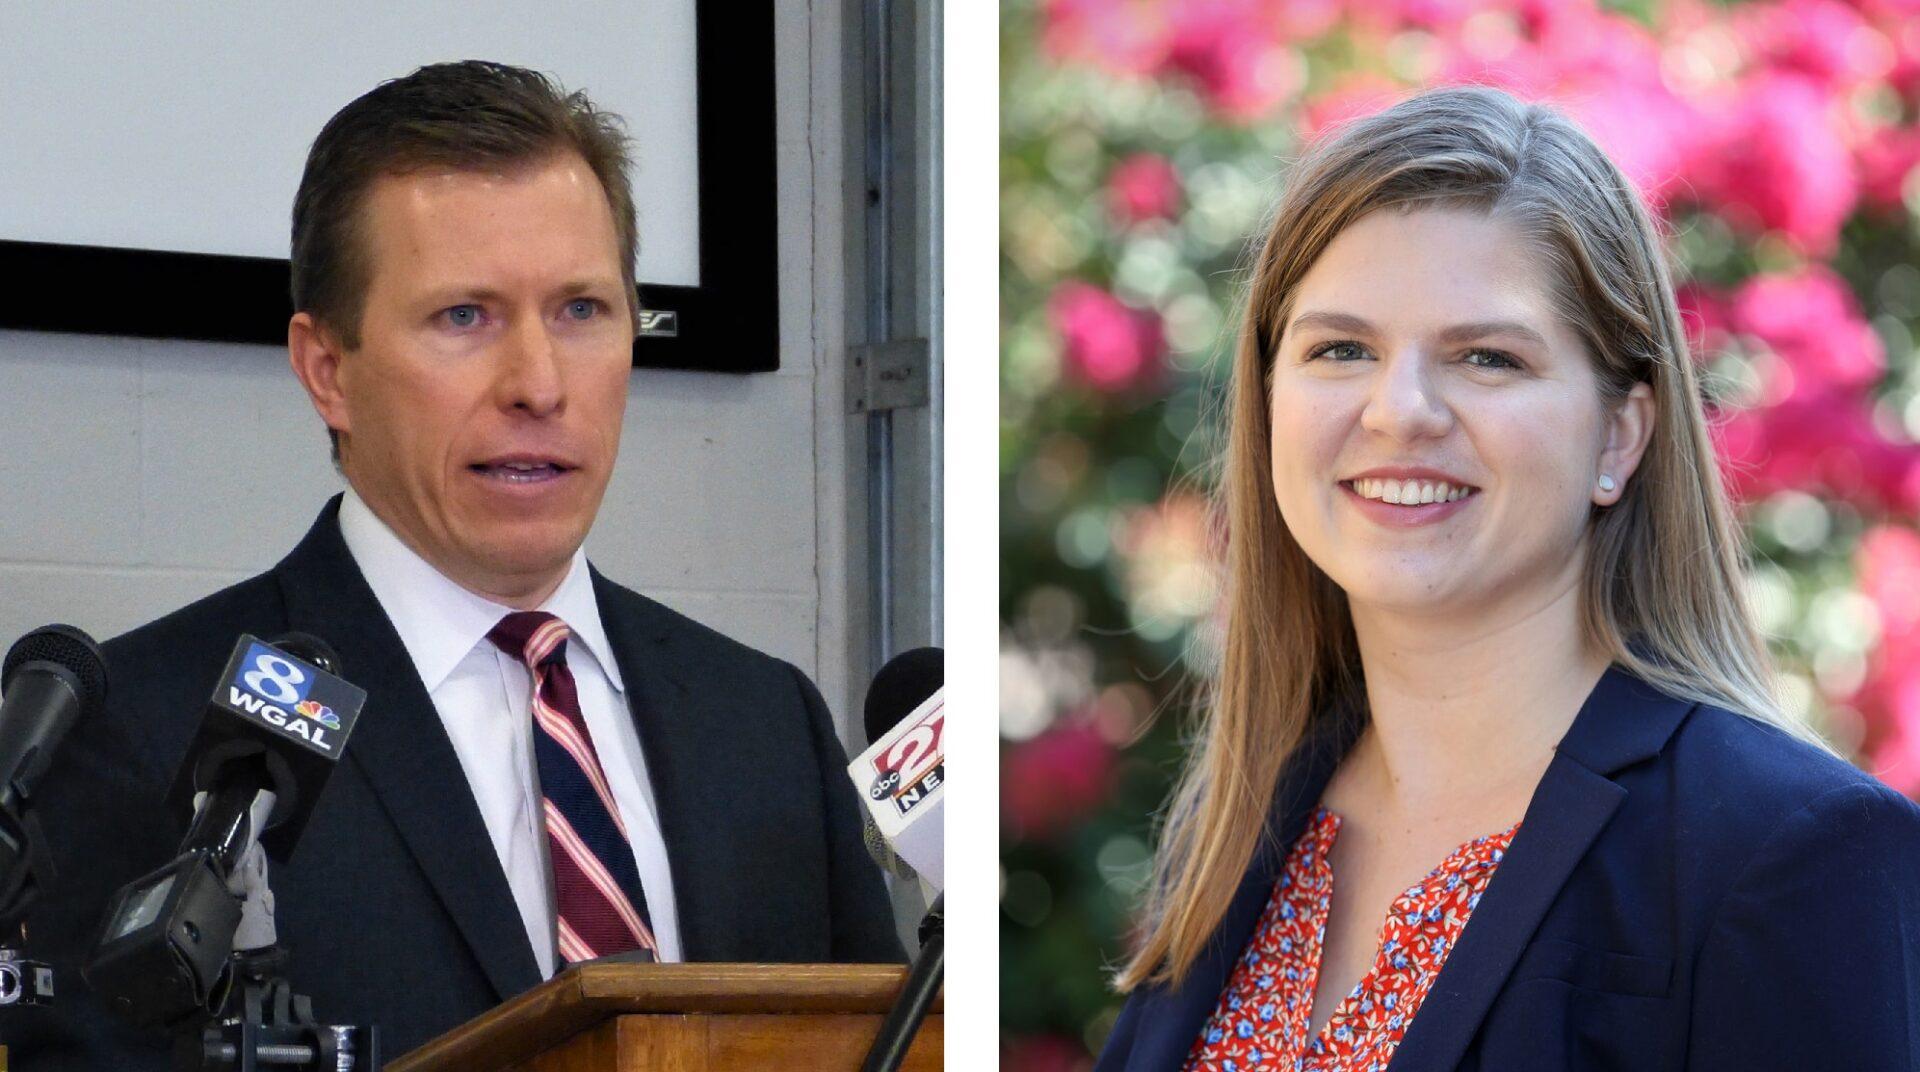 County Commissioner Josh Parsons, left; Franklin & Marshall Professor Jennifer Meyer, right.